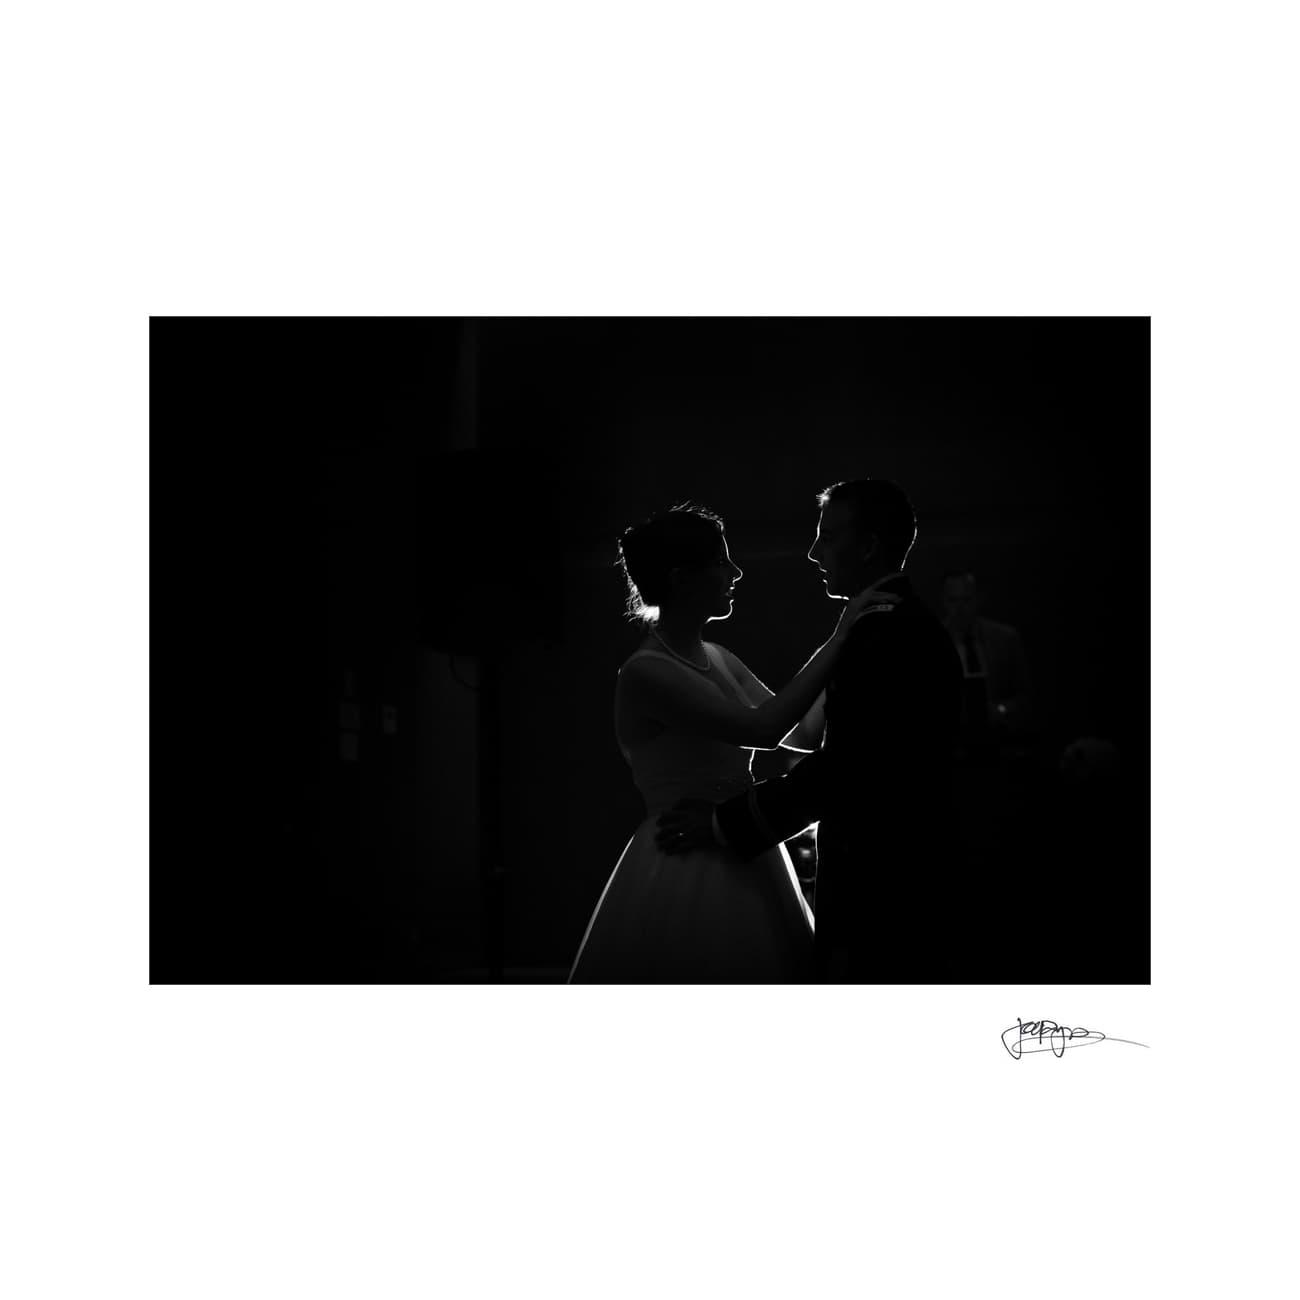 Alexandra&JohnOut1343